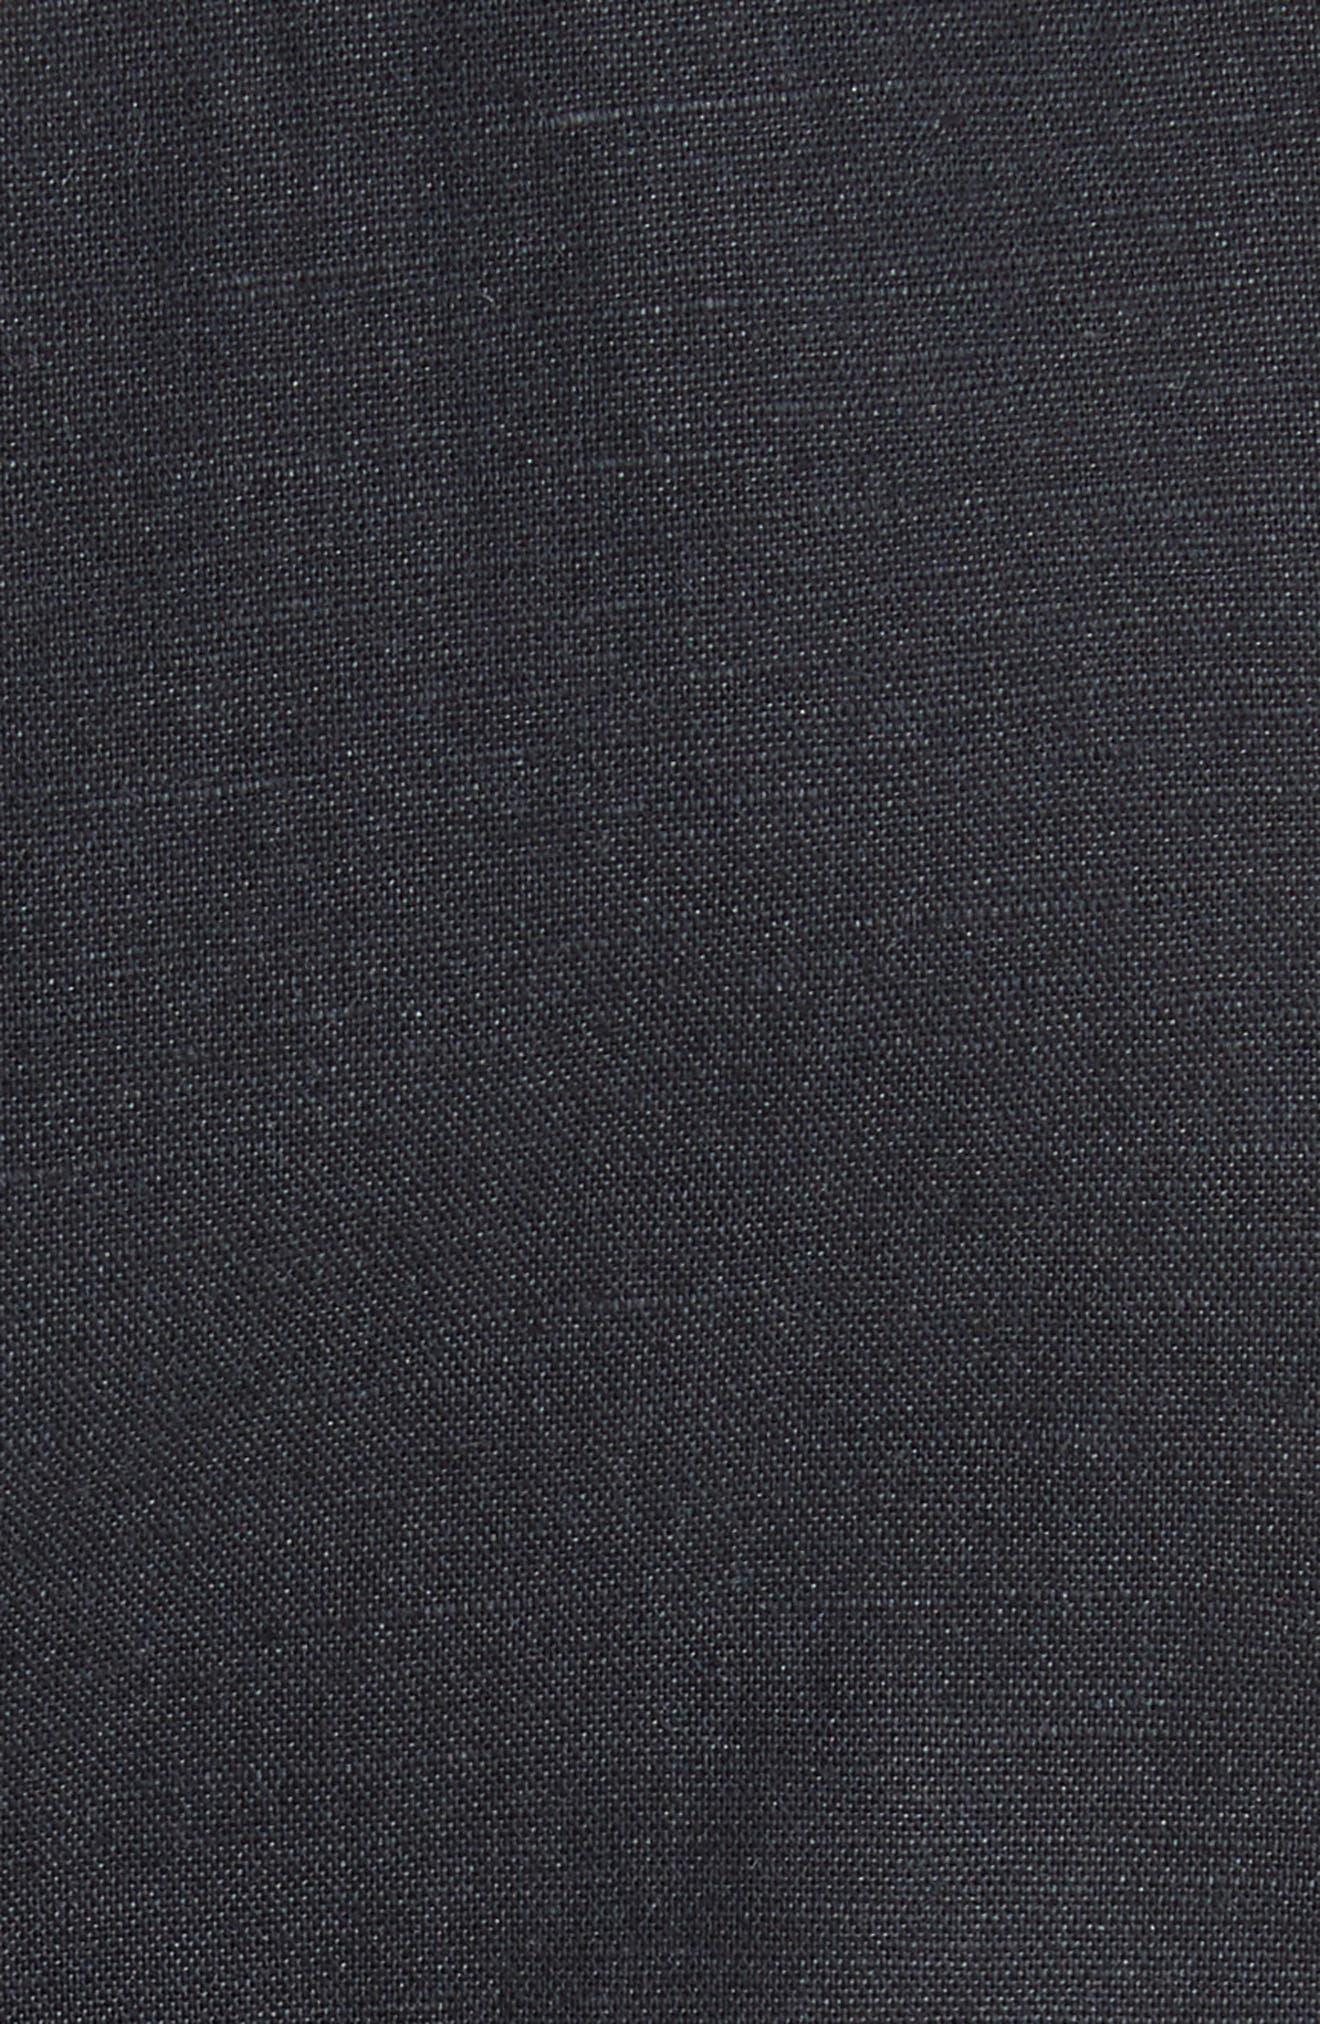 Circular Print Asymmetrical Draped Dress,                             Alternate thumbnail 6, color,                             Wht/ Blk X Blk